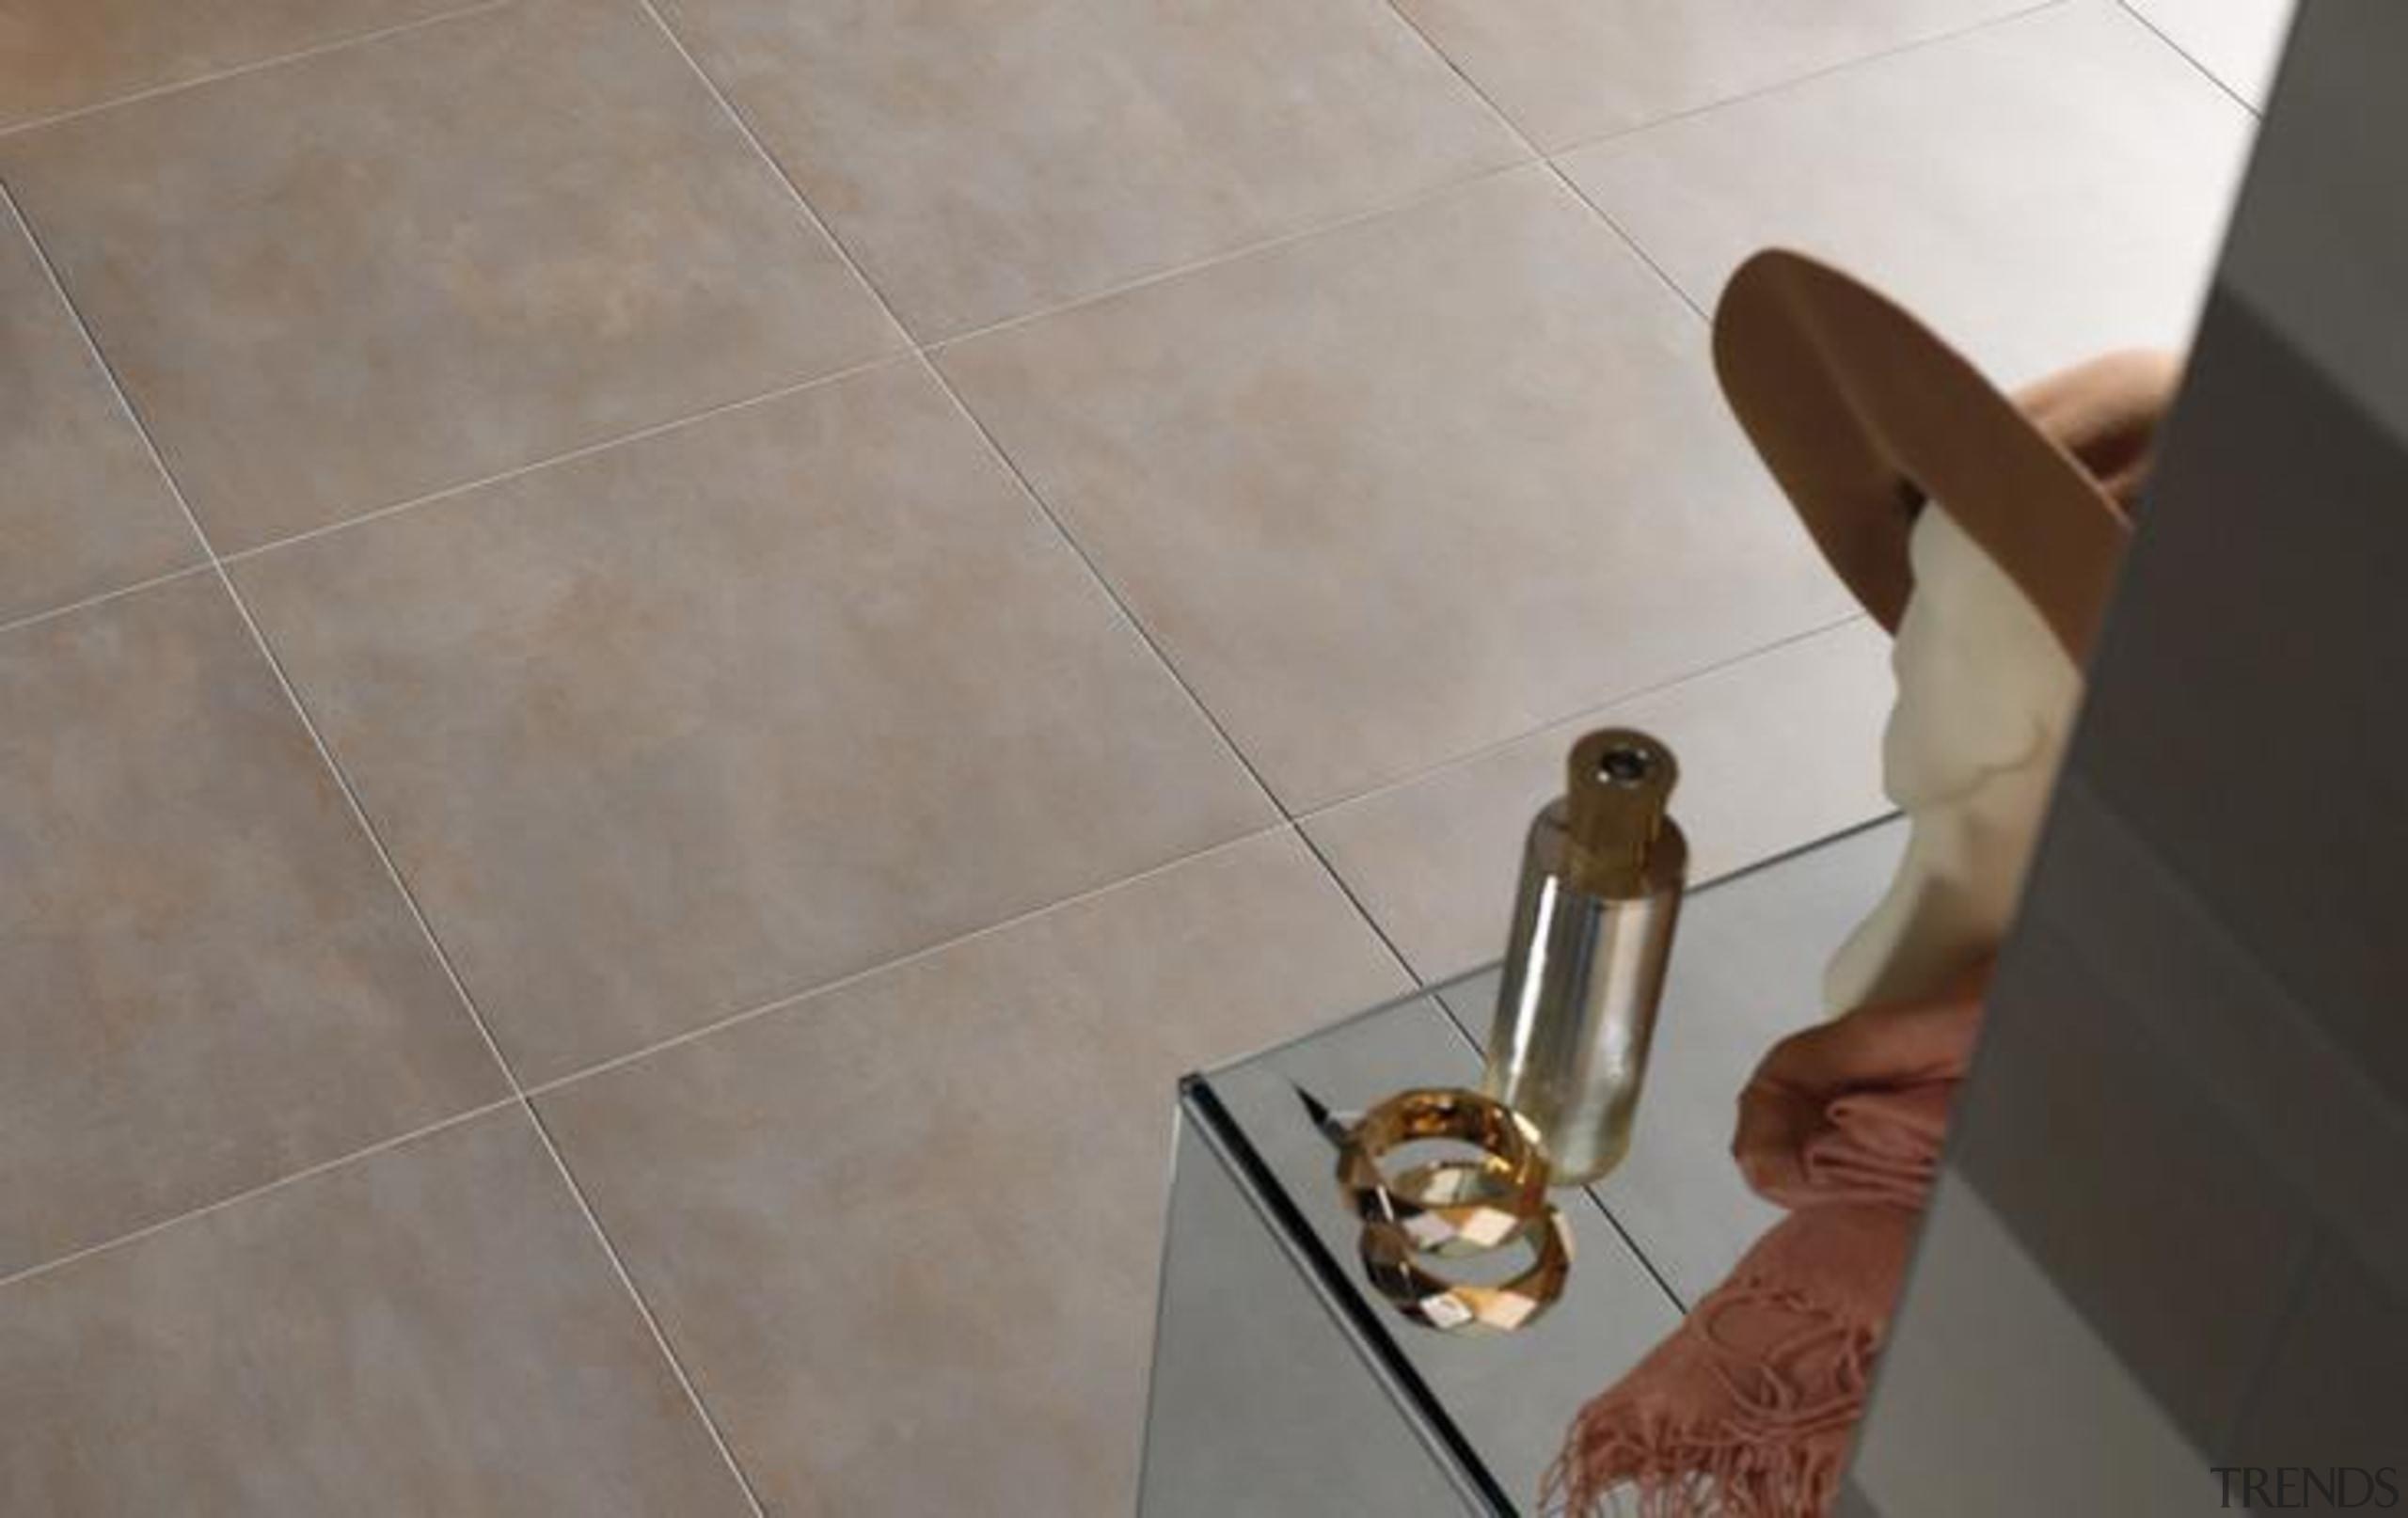 Earthstone clay grey interior floor tiles - Earthstone floor, flooring, tile, gray